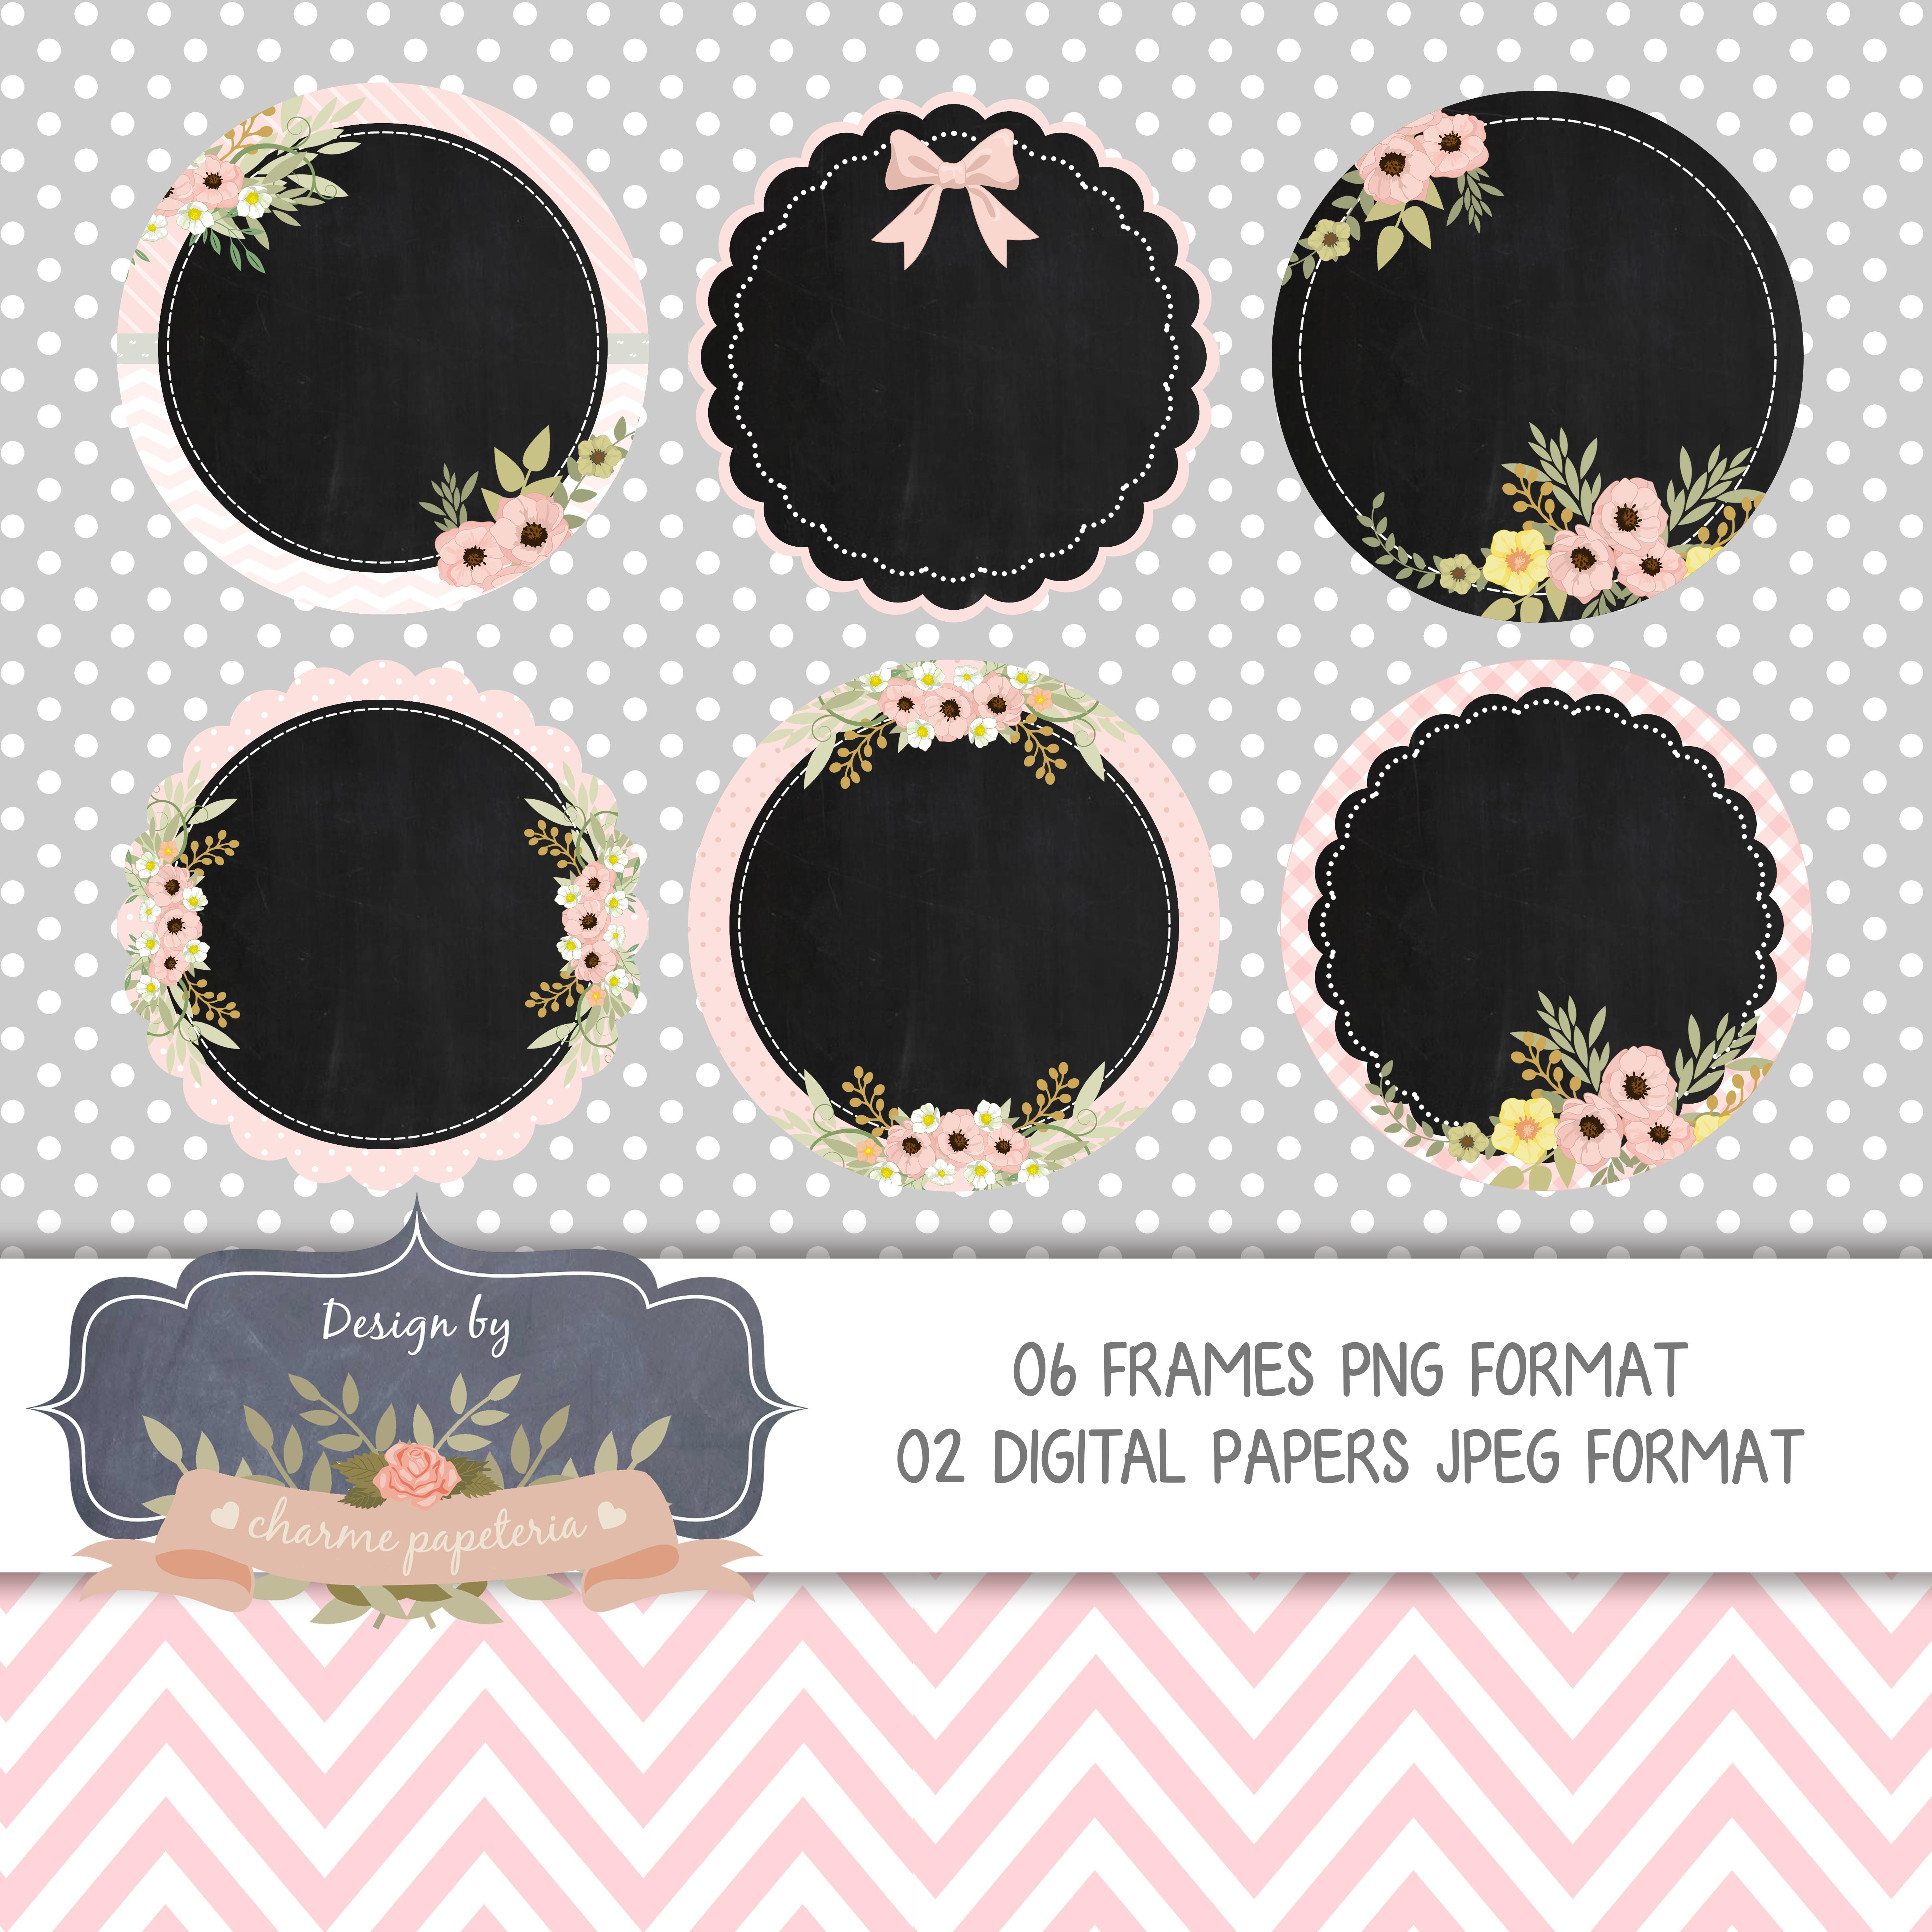 Molduras Chalkboards Floral Rosa E Cinza No Elo7 Charme Papeteria